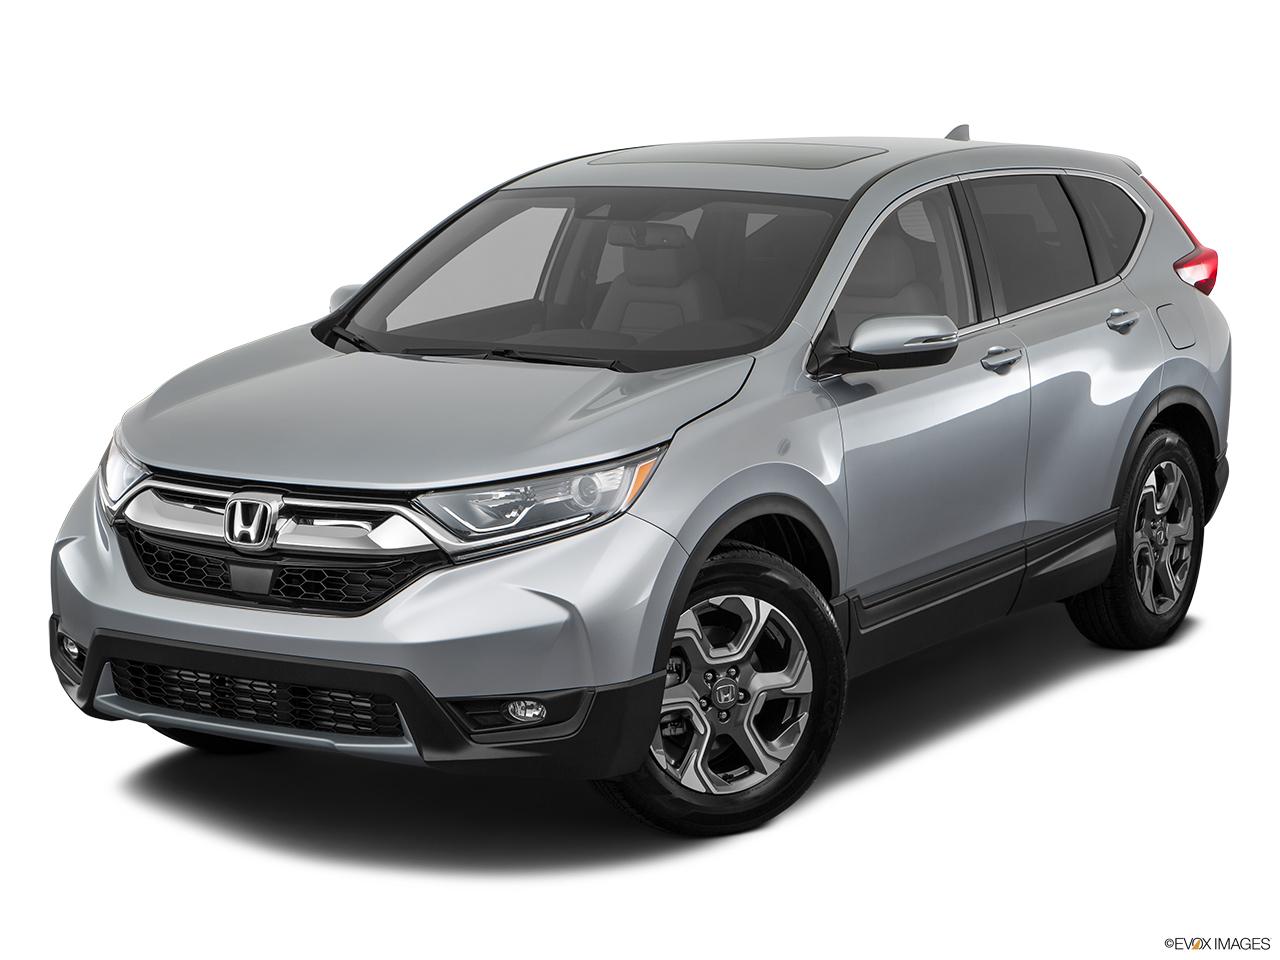 2017 honda cr v prices in uae gulf specs reviews for for Honda cr v dimensions 2017